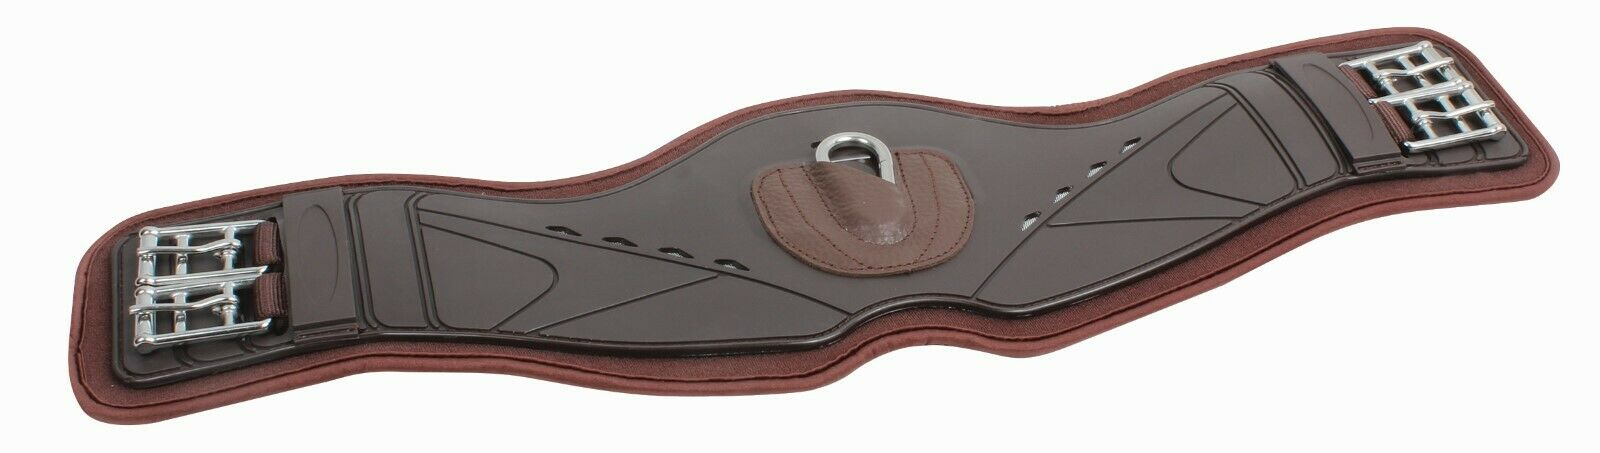 Nuevo Professional's Choice contorneada monoflap circunferencia de 28 , Chocolate